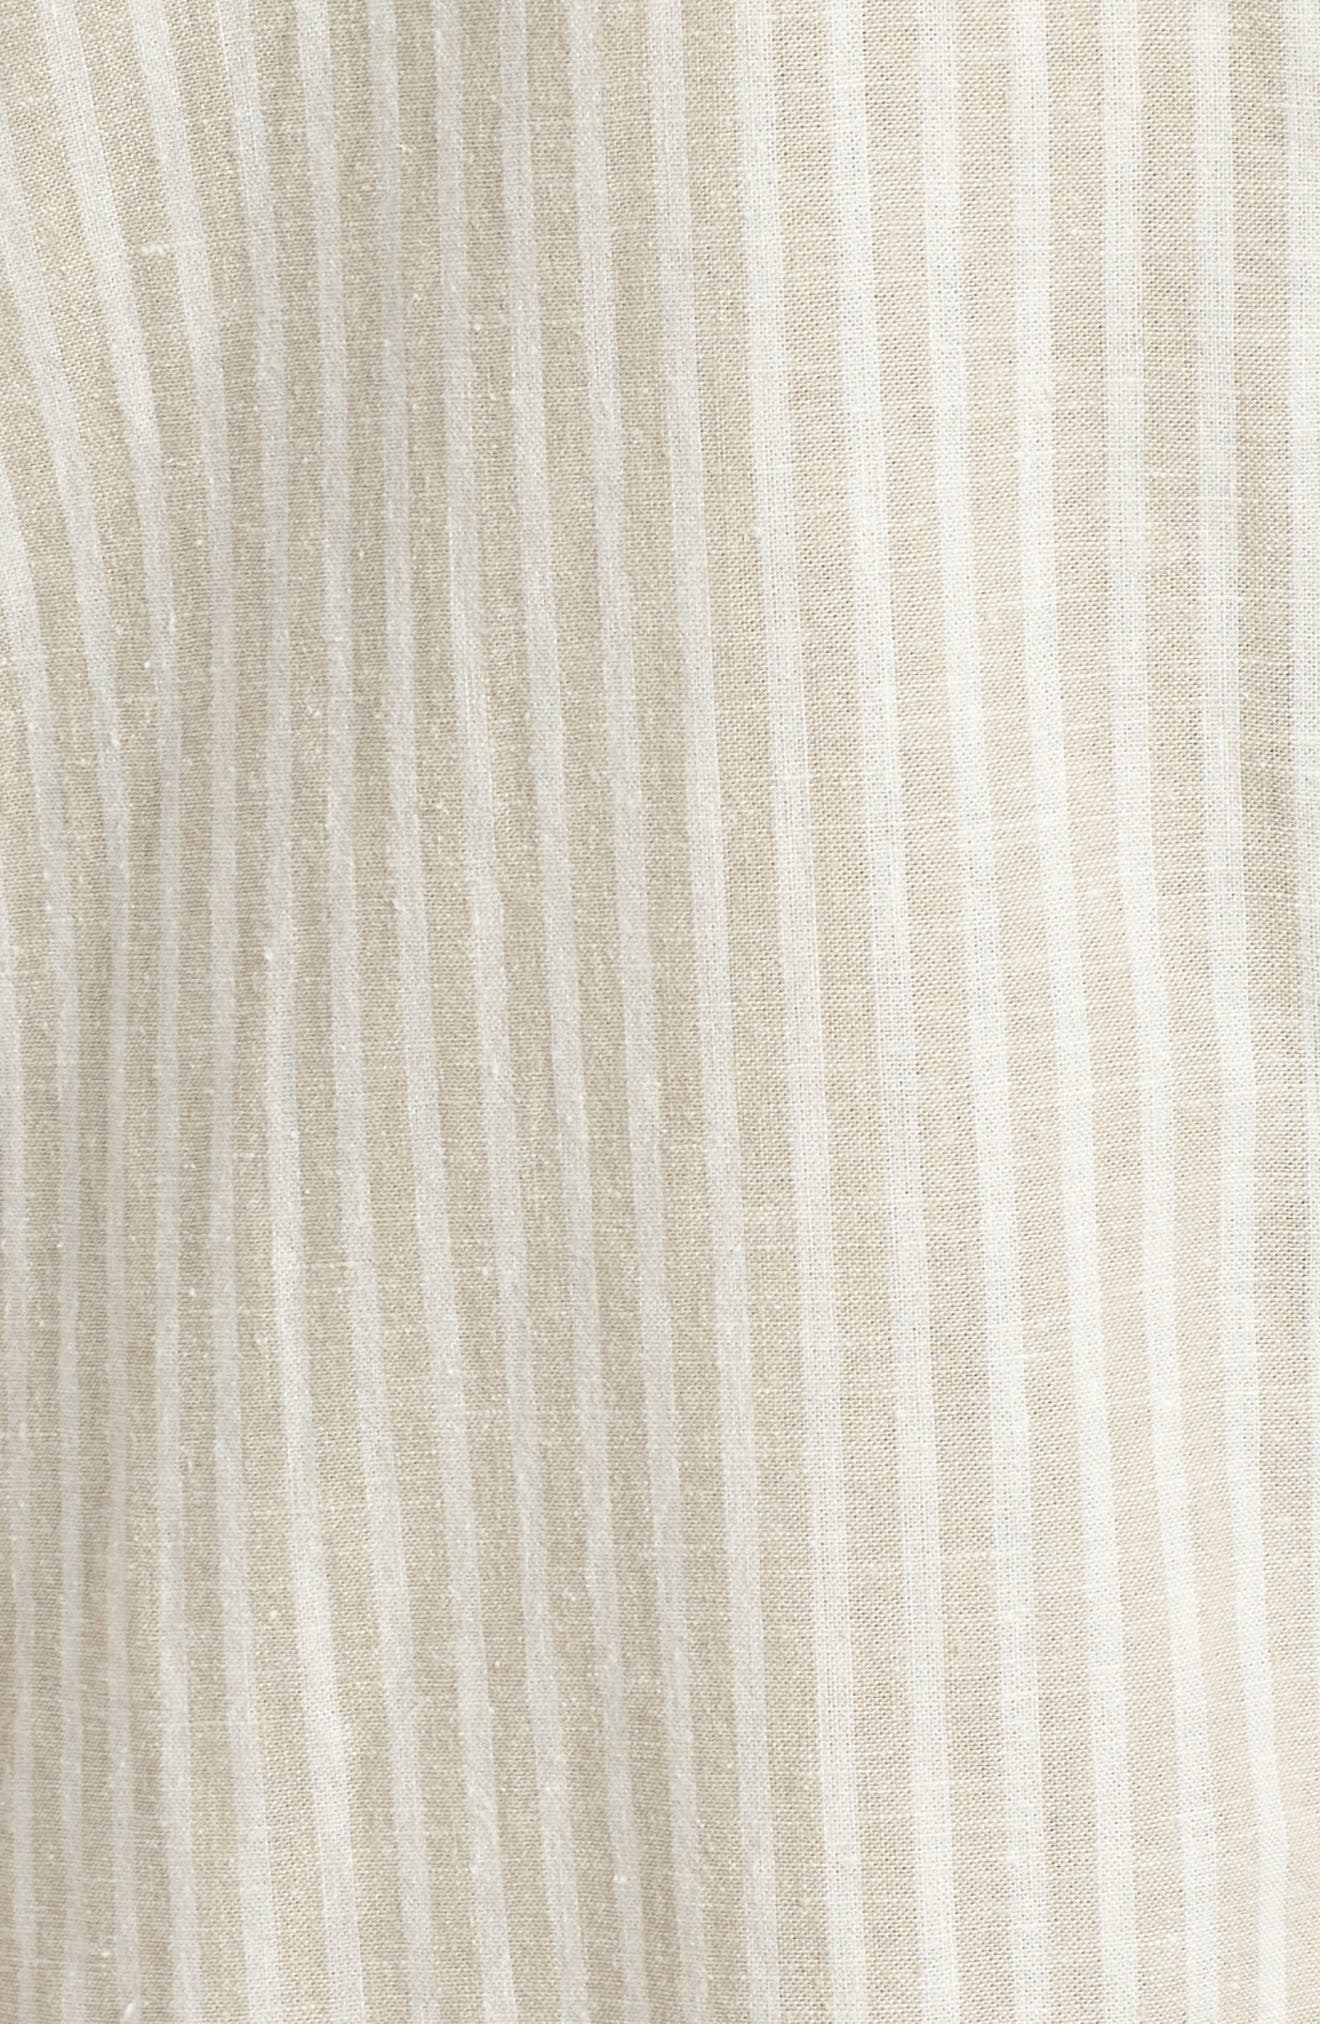 Stripe Tunic Top,                             Alternate thumbnail 6, color,                             257